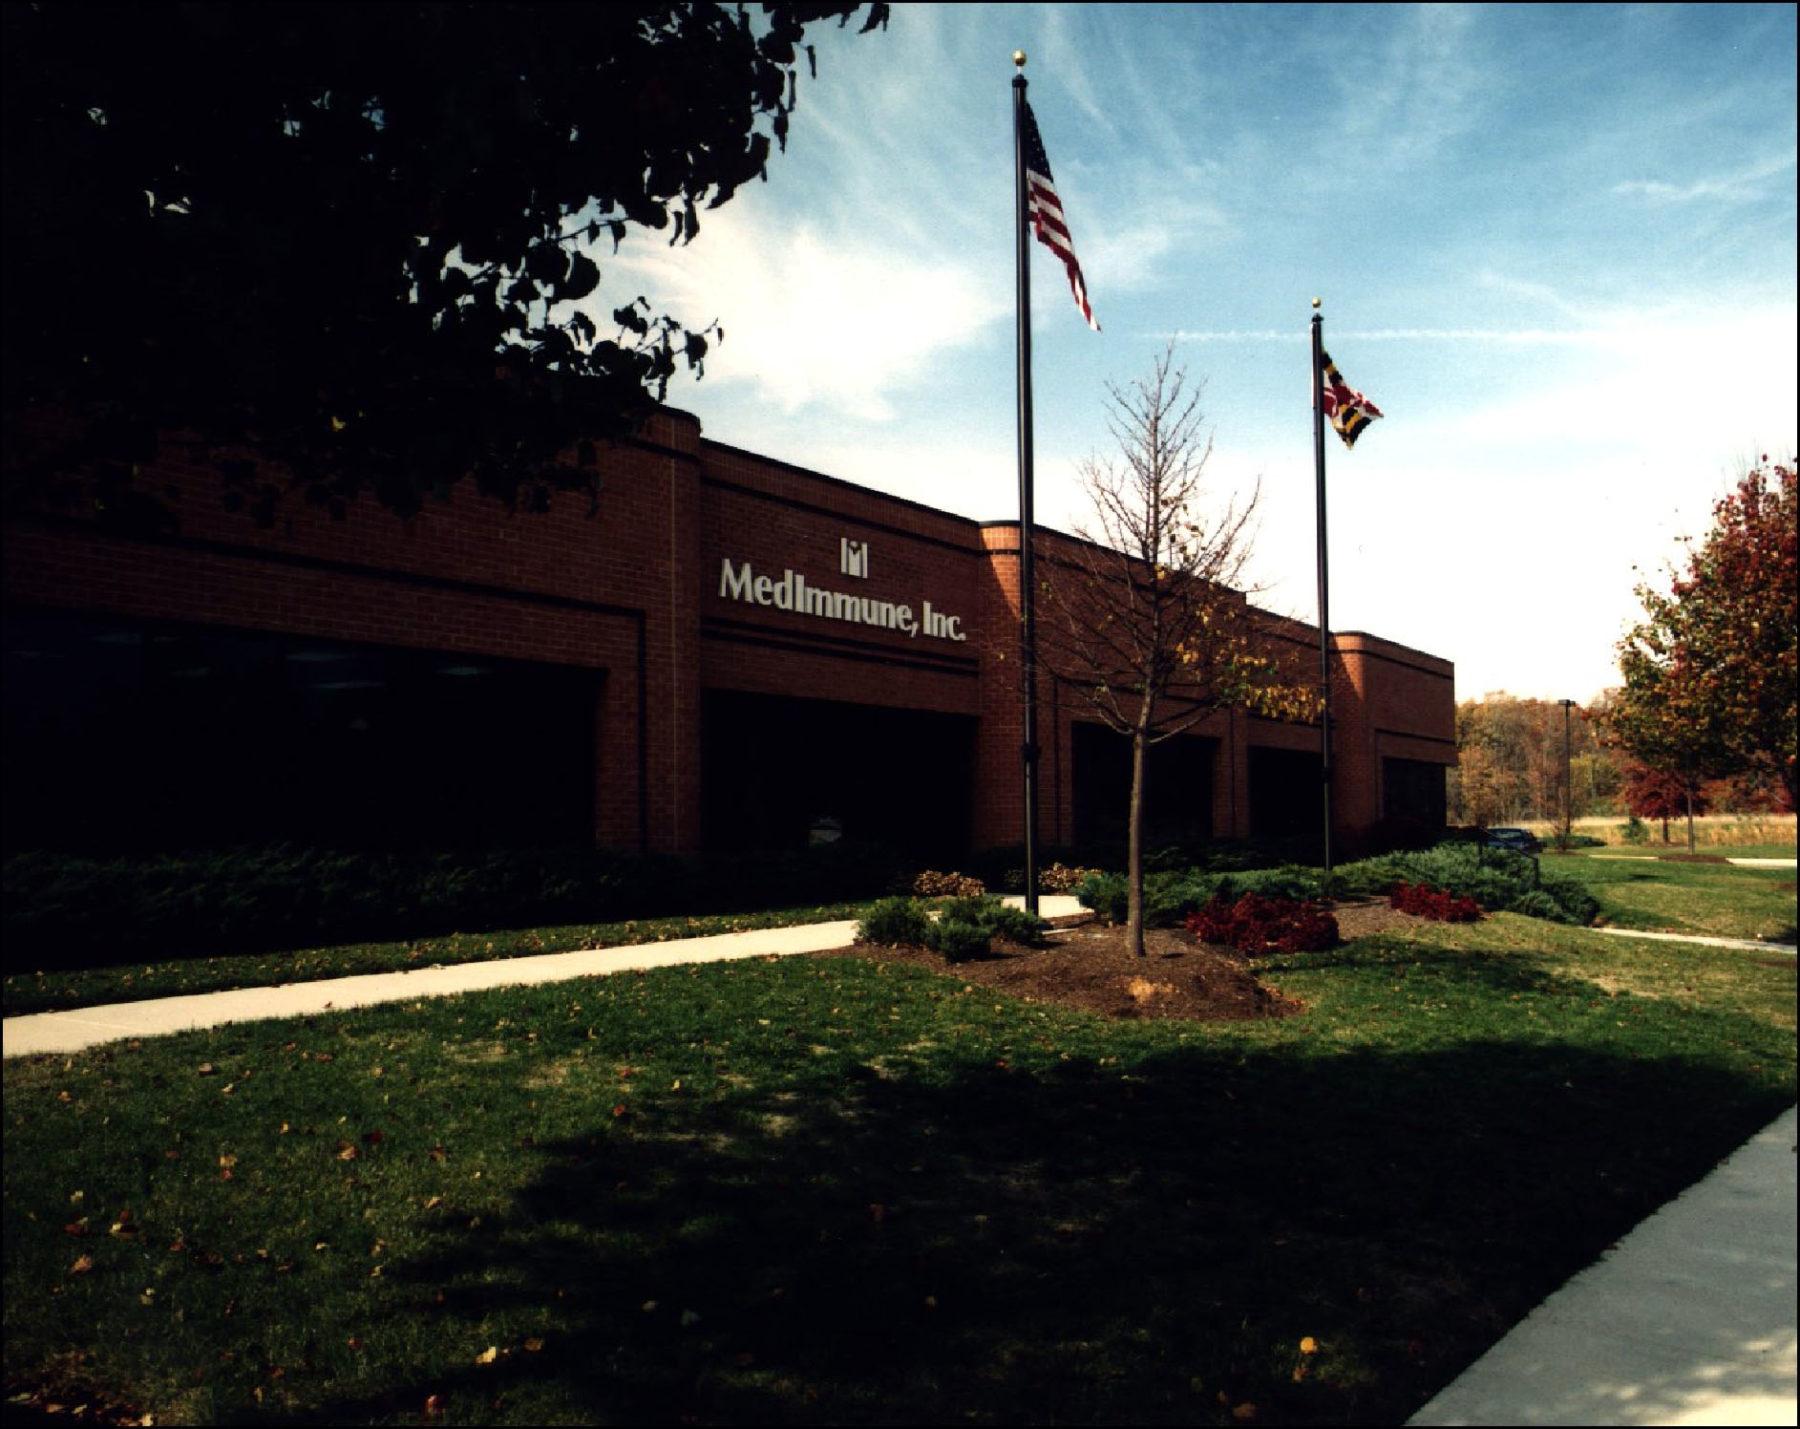 MedImmune, Inc.